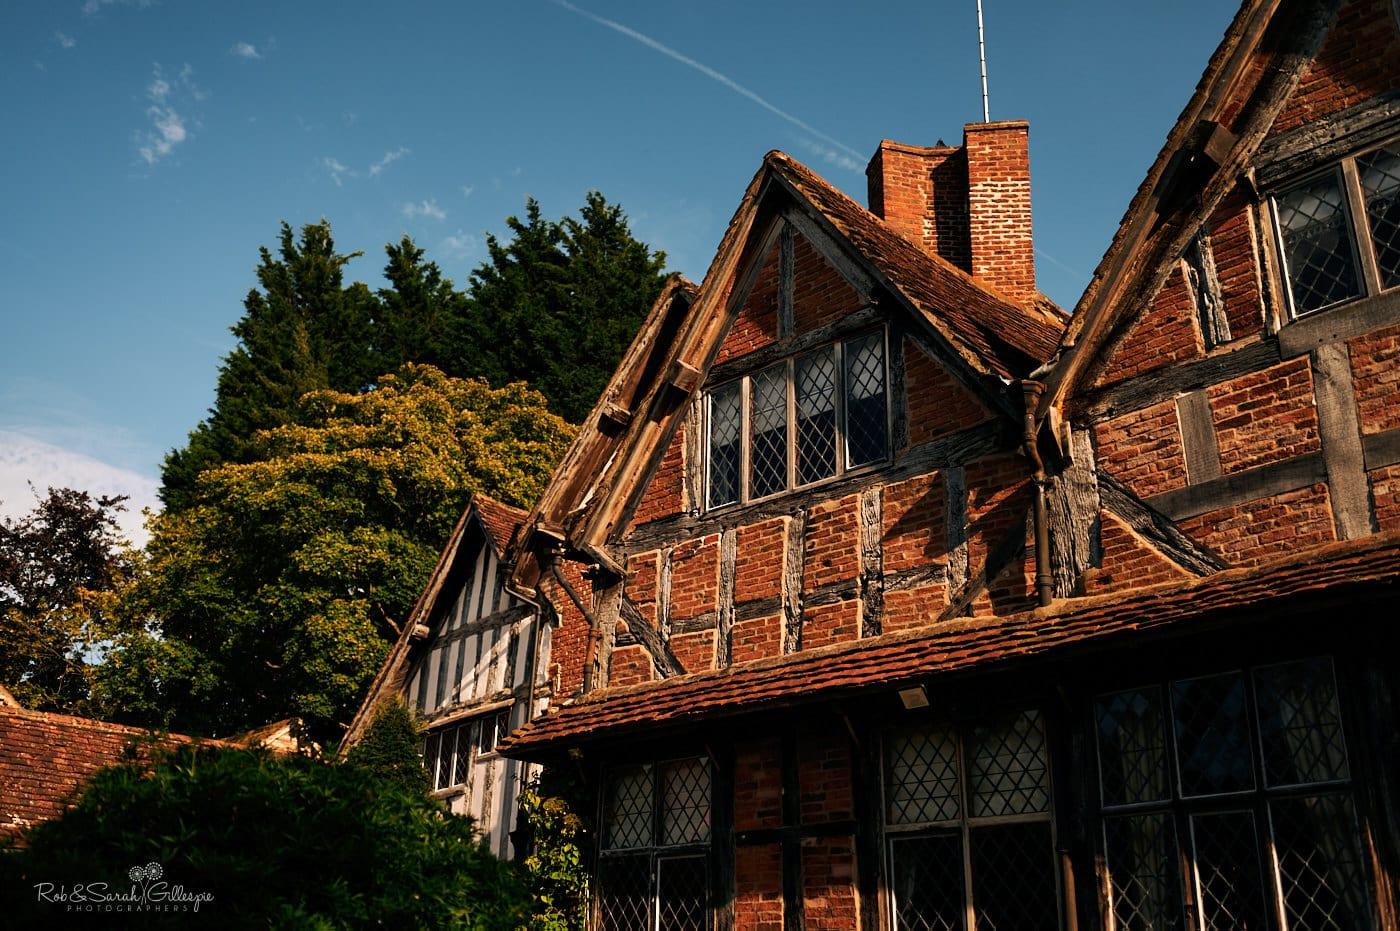 Exteriror of Gorcott Hall on bright summer afternoon